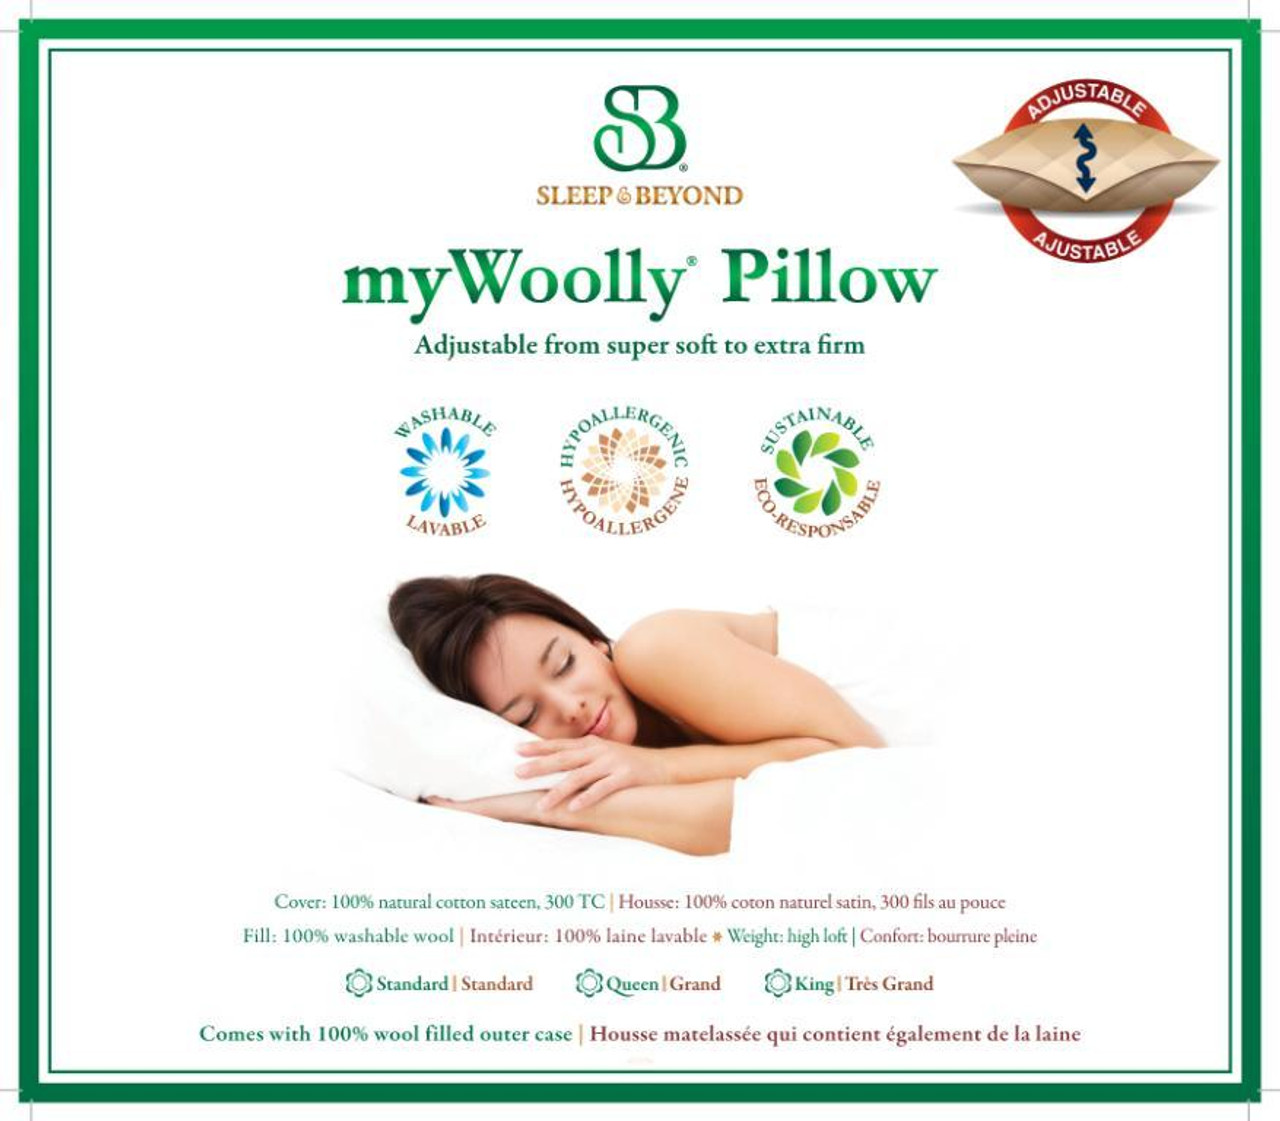 Sleep & Beyond myWool Pillow™ 100% Washable Wool Pillow Product Sheet 2